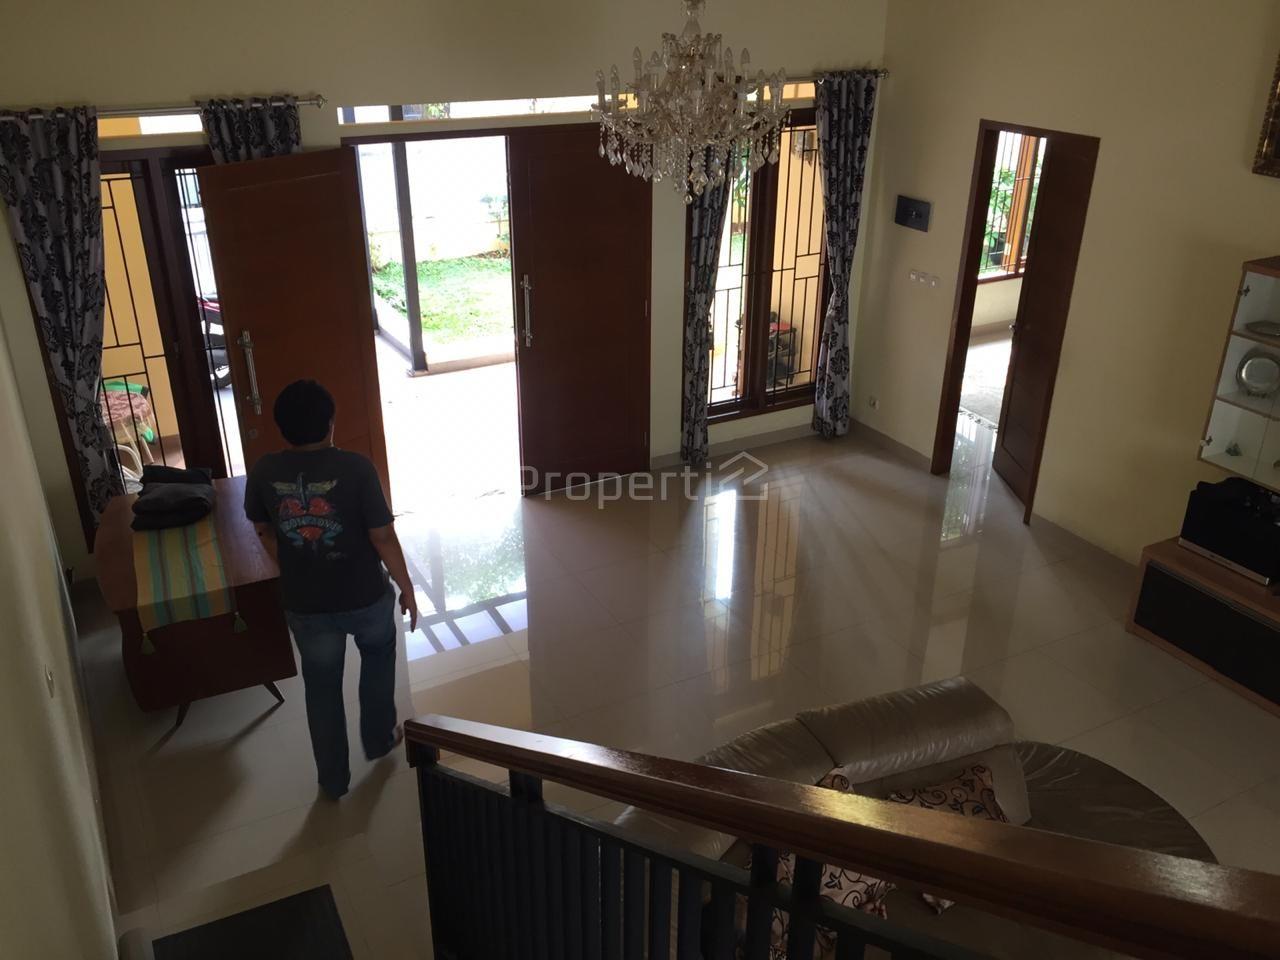 Rumah Perumahan di Perumahan Bukit Cirendeu, Banten